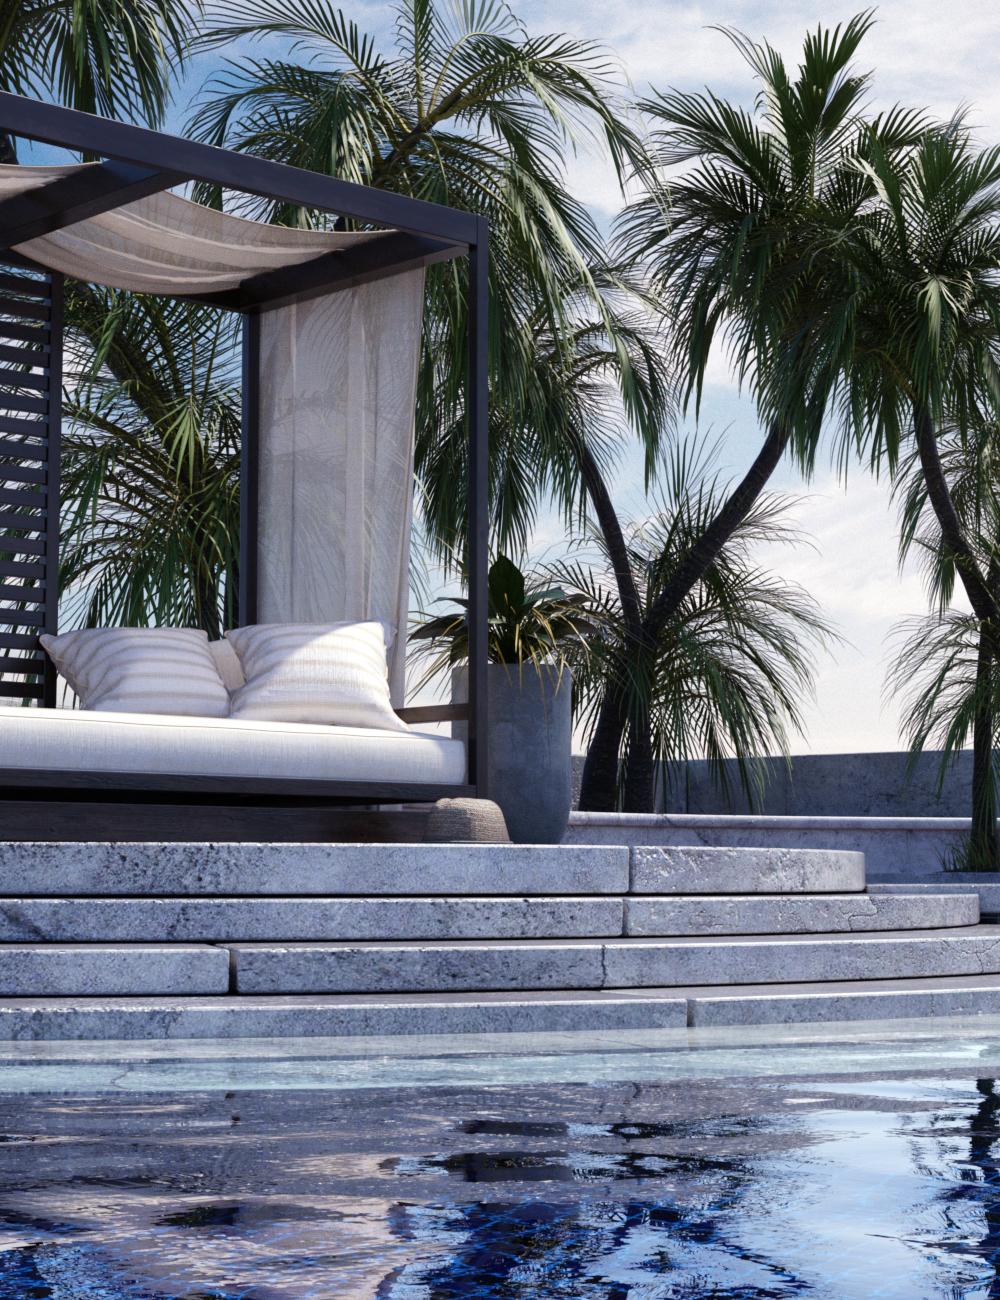 DGV Palm Resort by: DG Vertex, 3D Models by Daz 3D